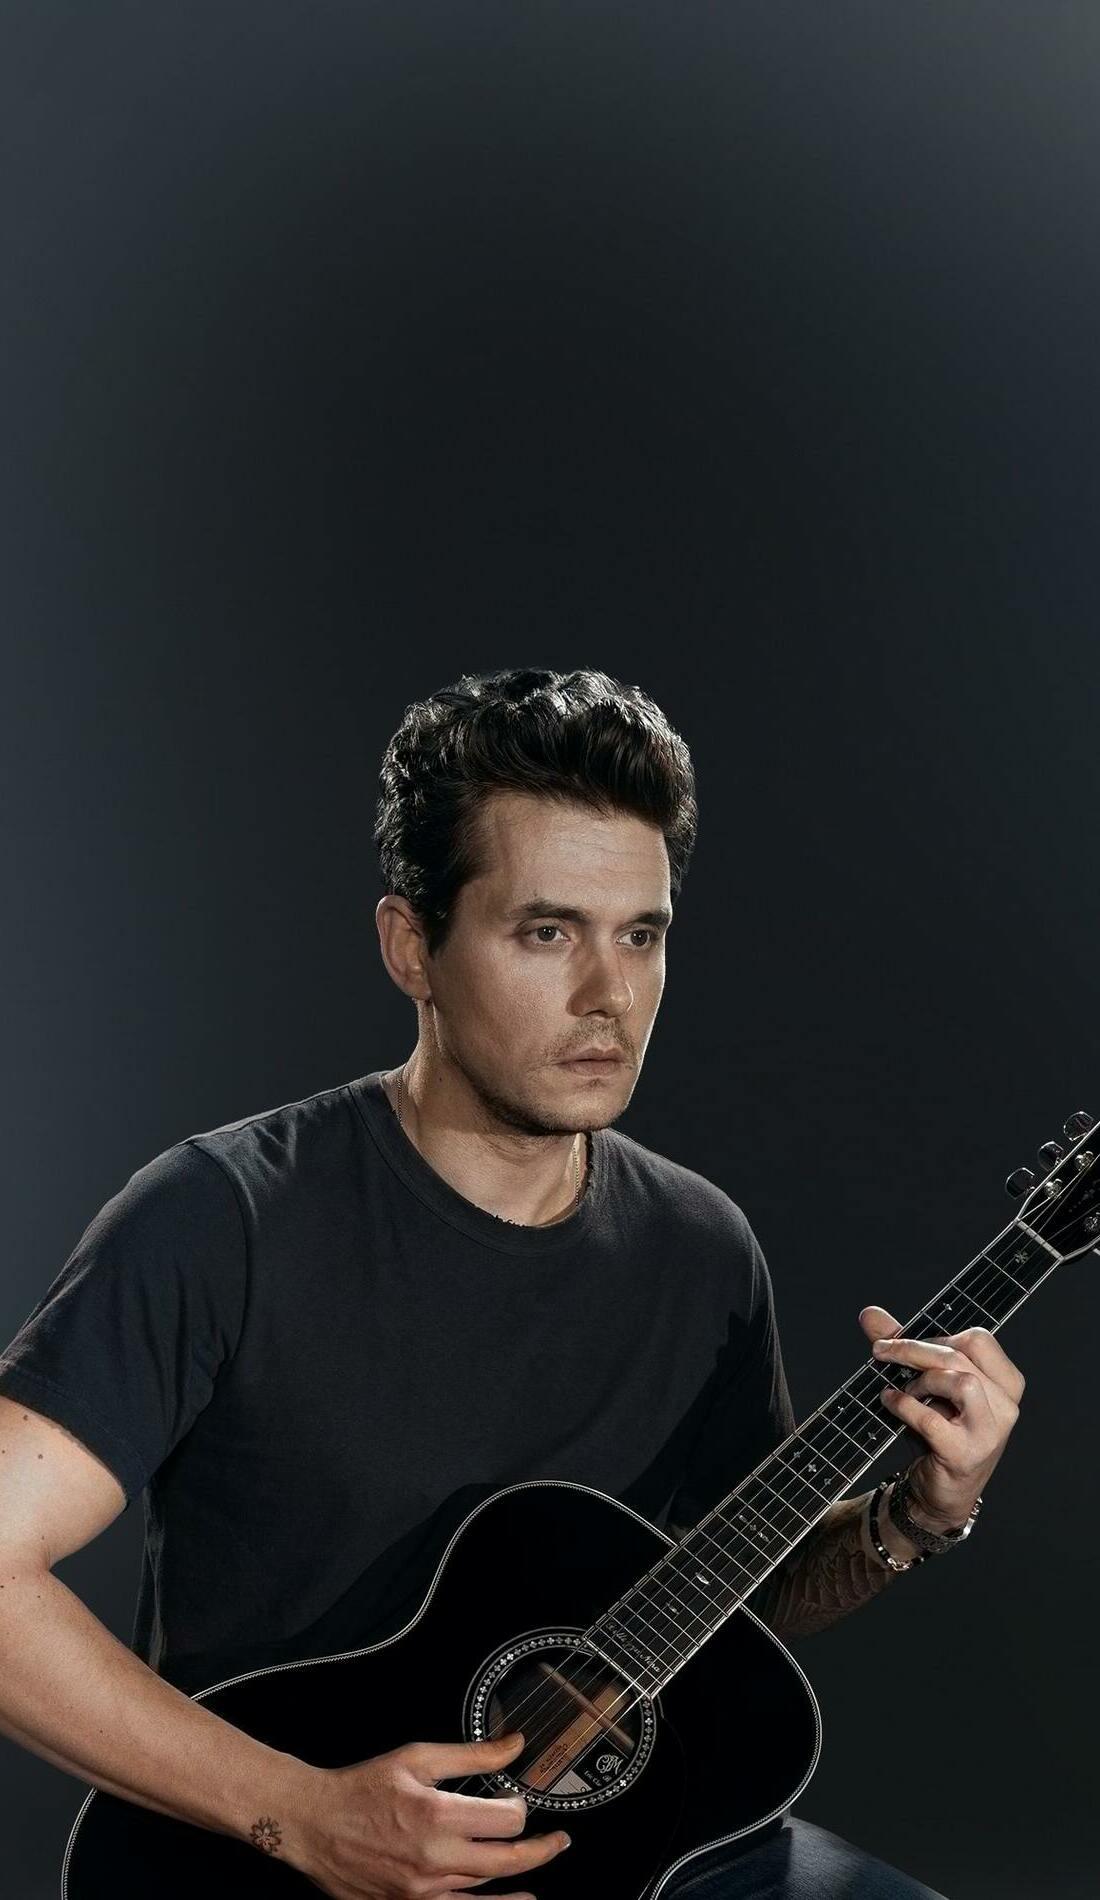 A John Mayer live event